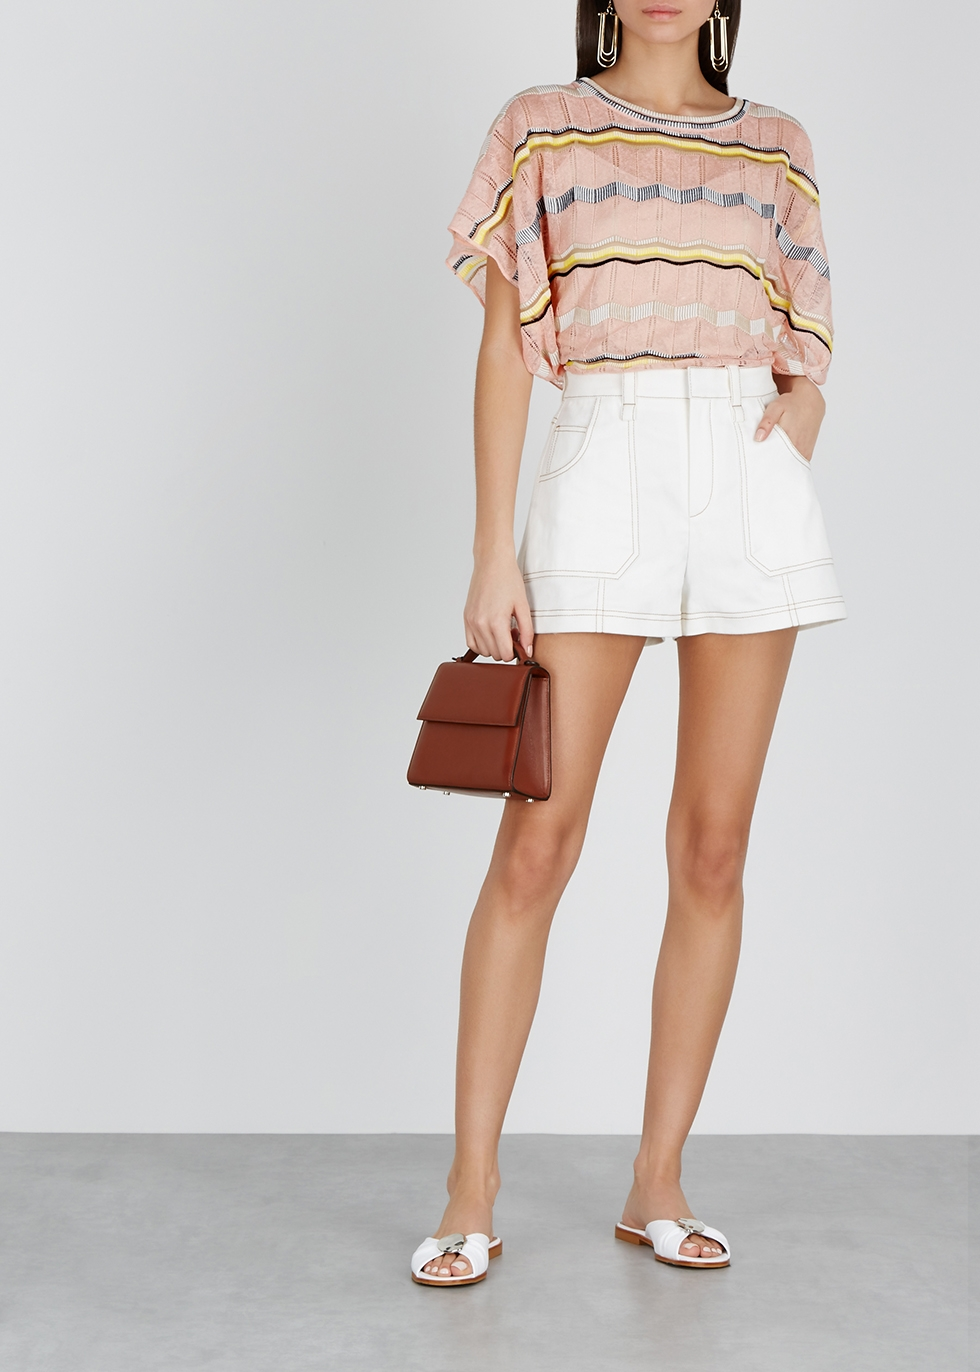 Zigzag fine-knit cotton-blend tunic - M Missoni